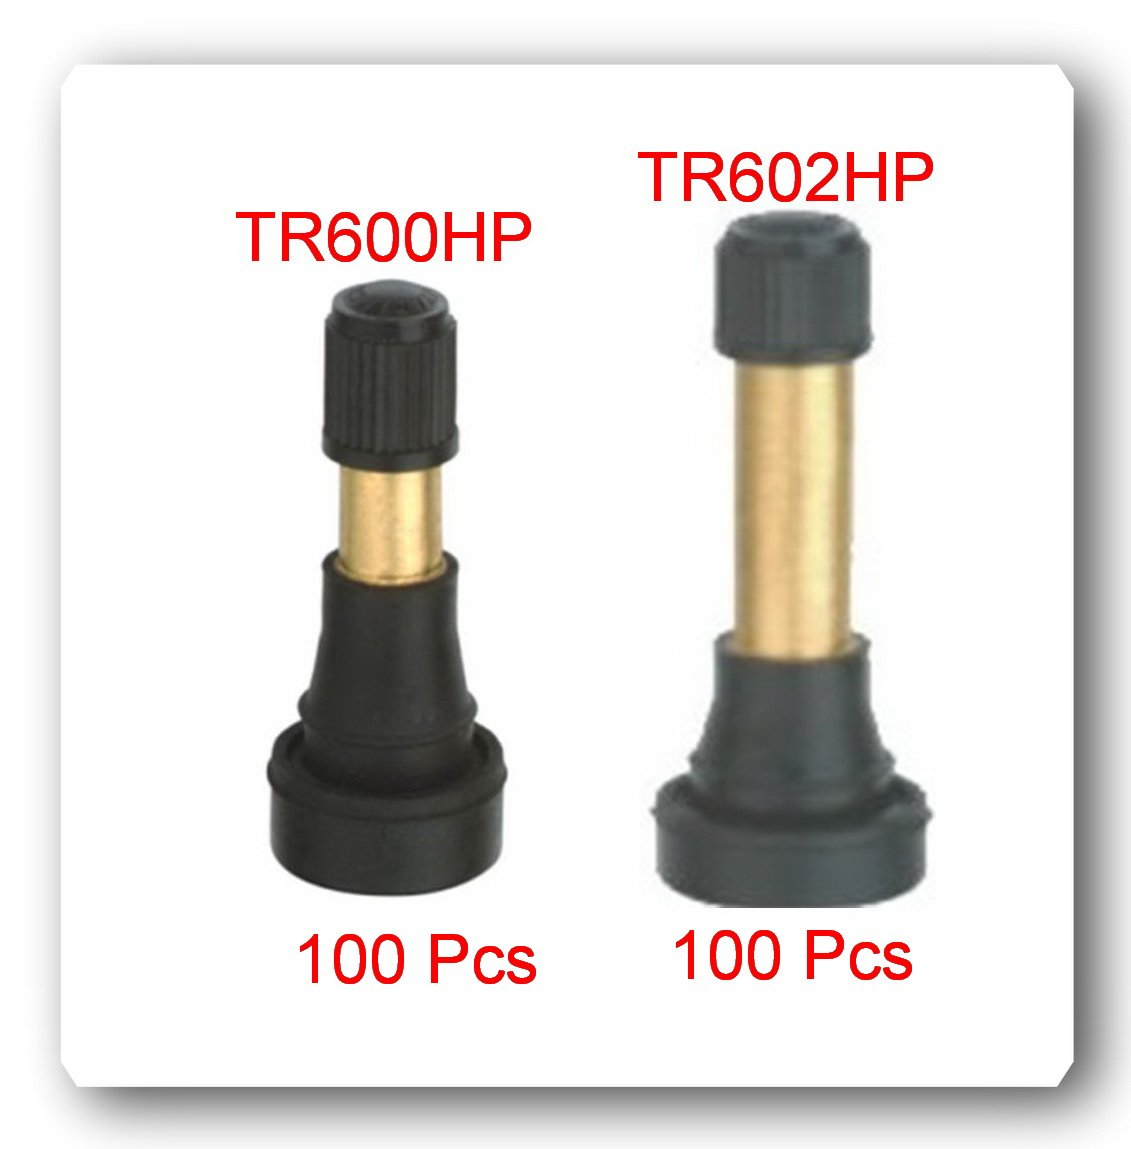 LOT200 SNAP-IN TIRE VALVE STEM 100 x TR600HP (50 x TR602HP) High Pressure Tire Wheel Valve Stems Heavy Duty Tire Valve Stem by VPro